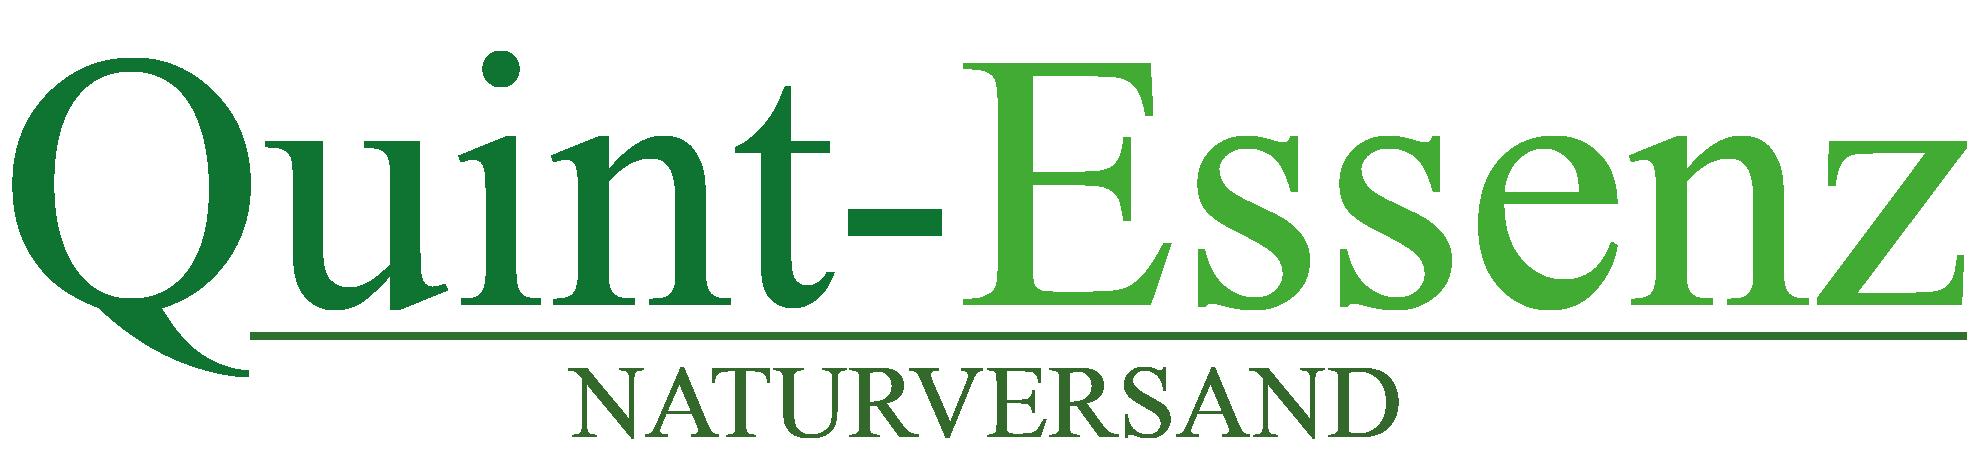 Quint-Essenz-Naturversand-Logo